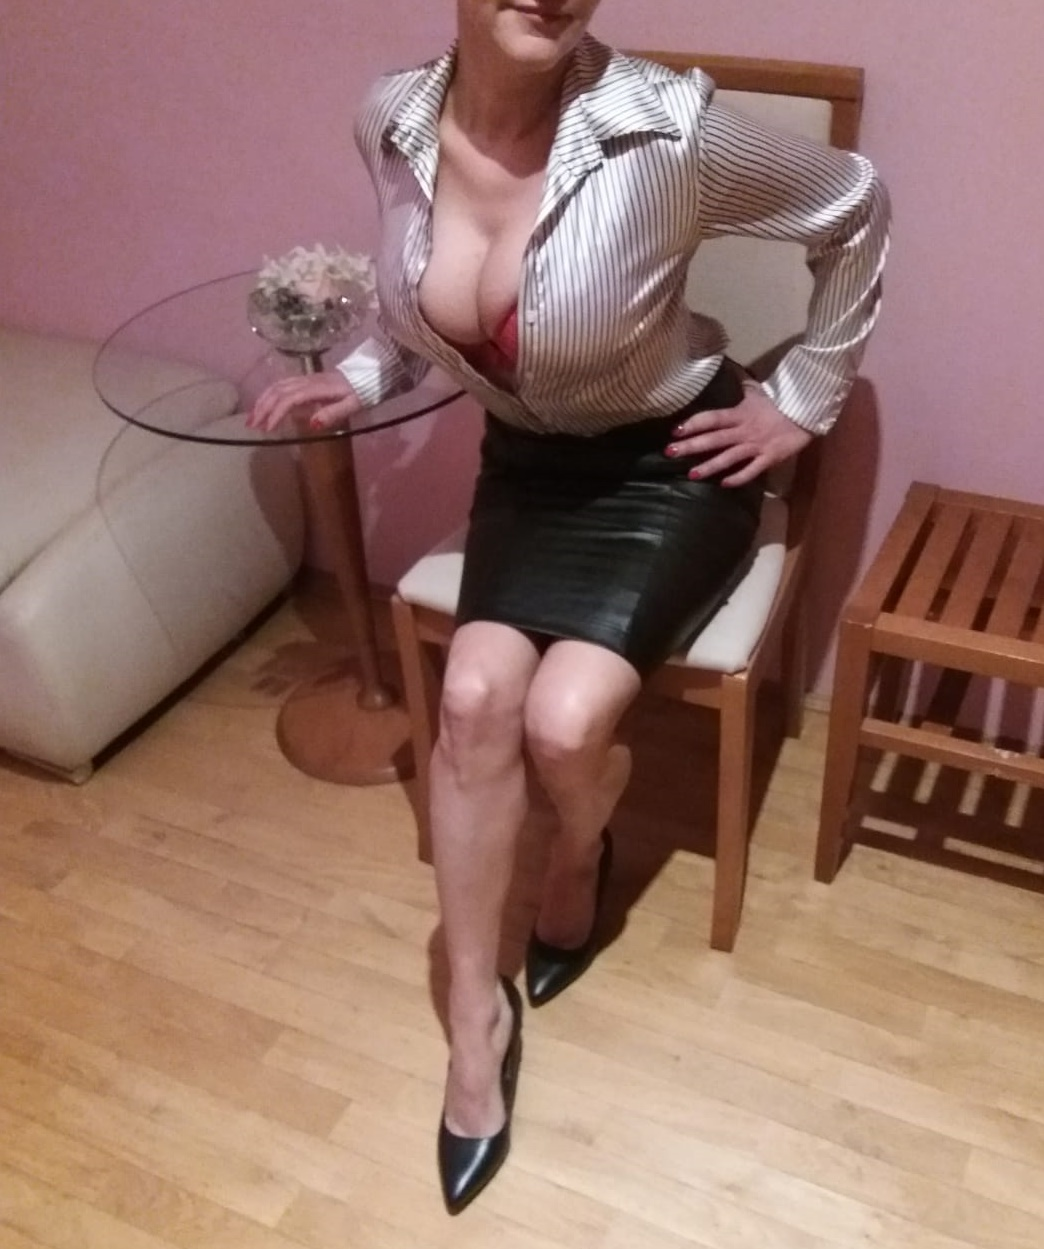 http://masazedomecek.cz/wp-content/uploads/2019/11/Diana-3-ano.jpg